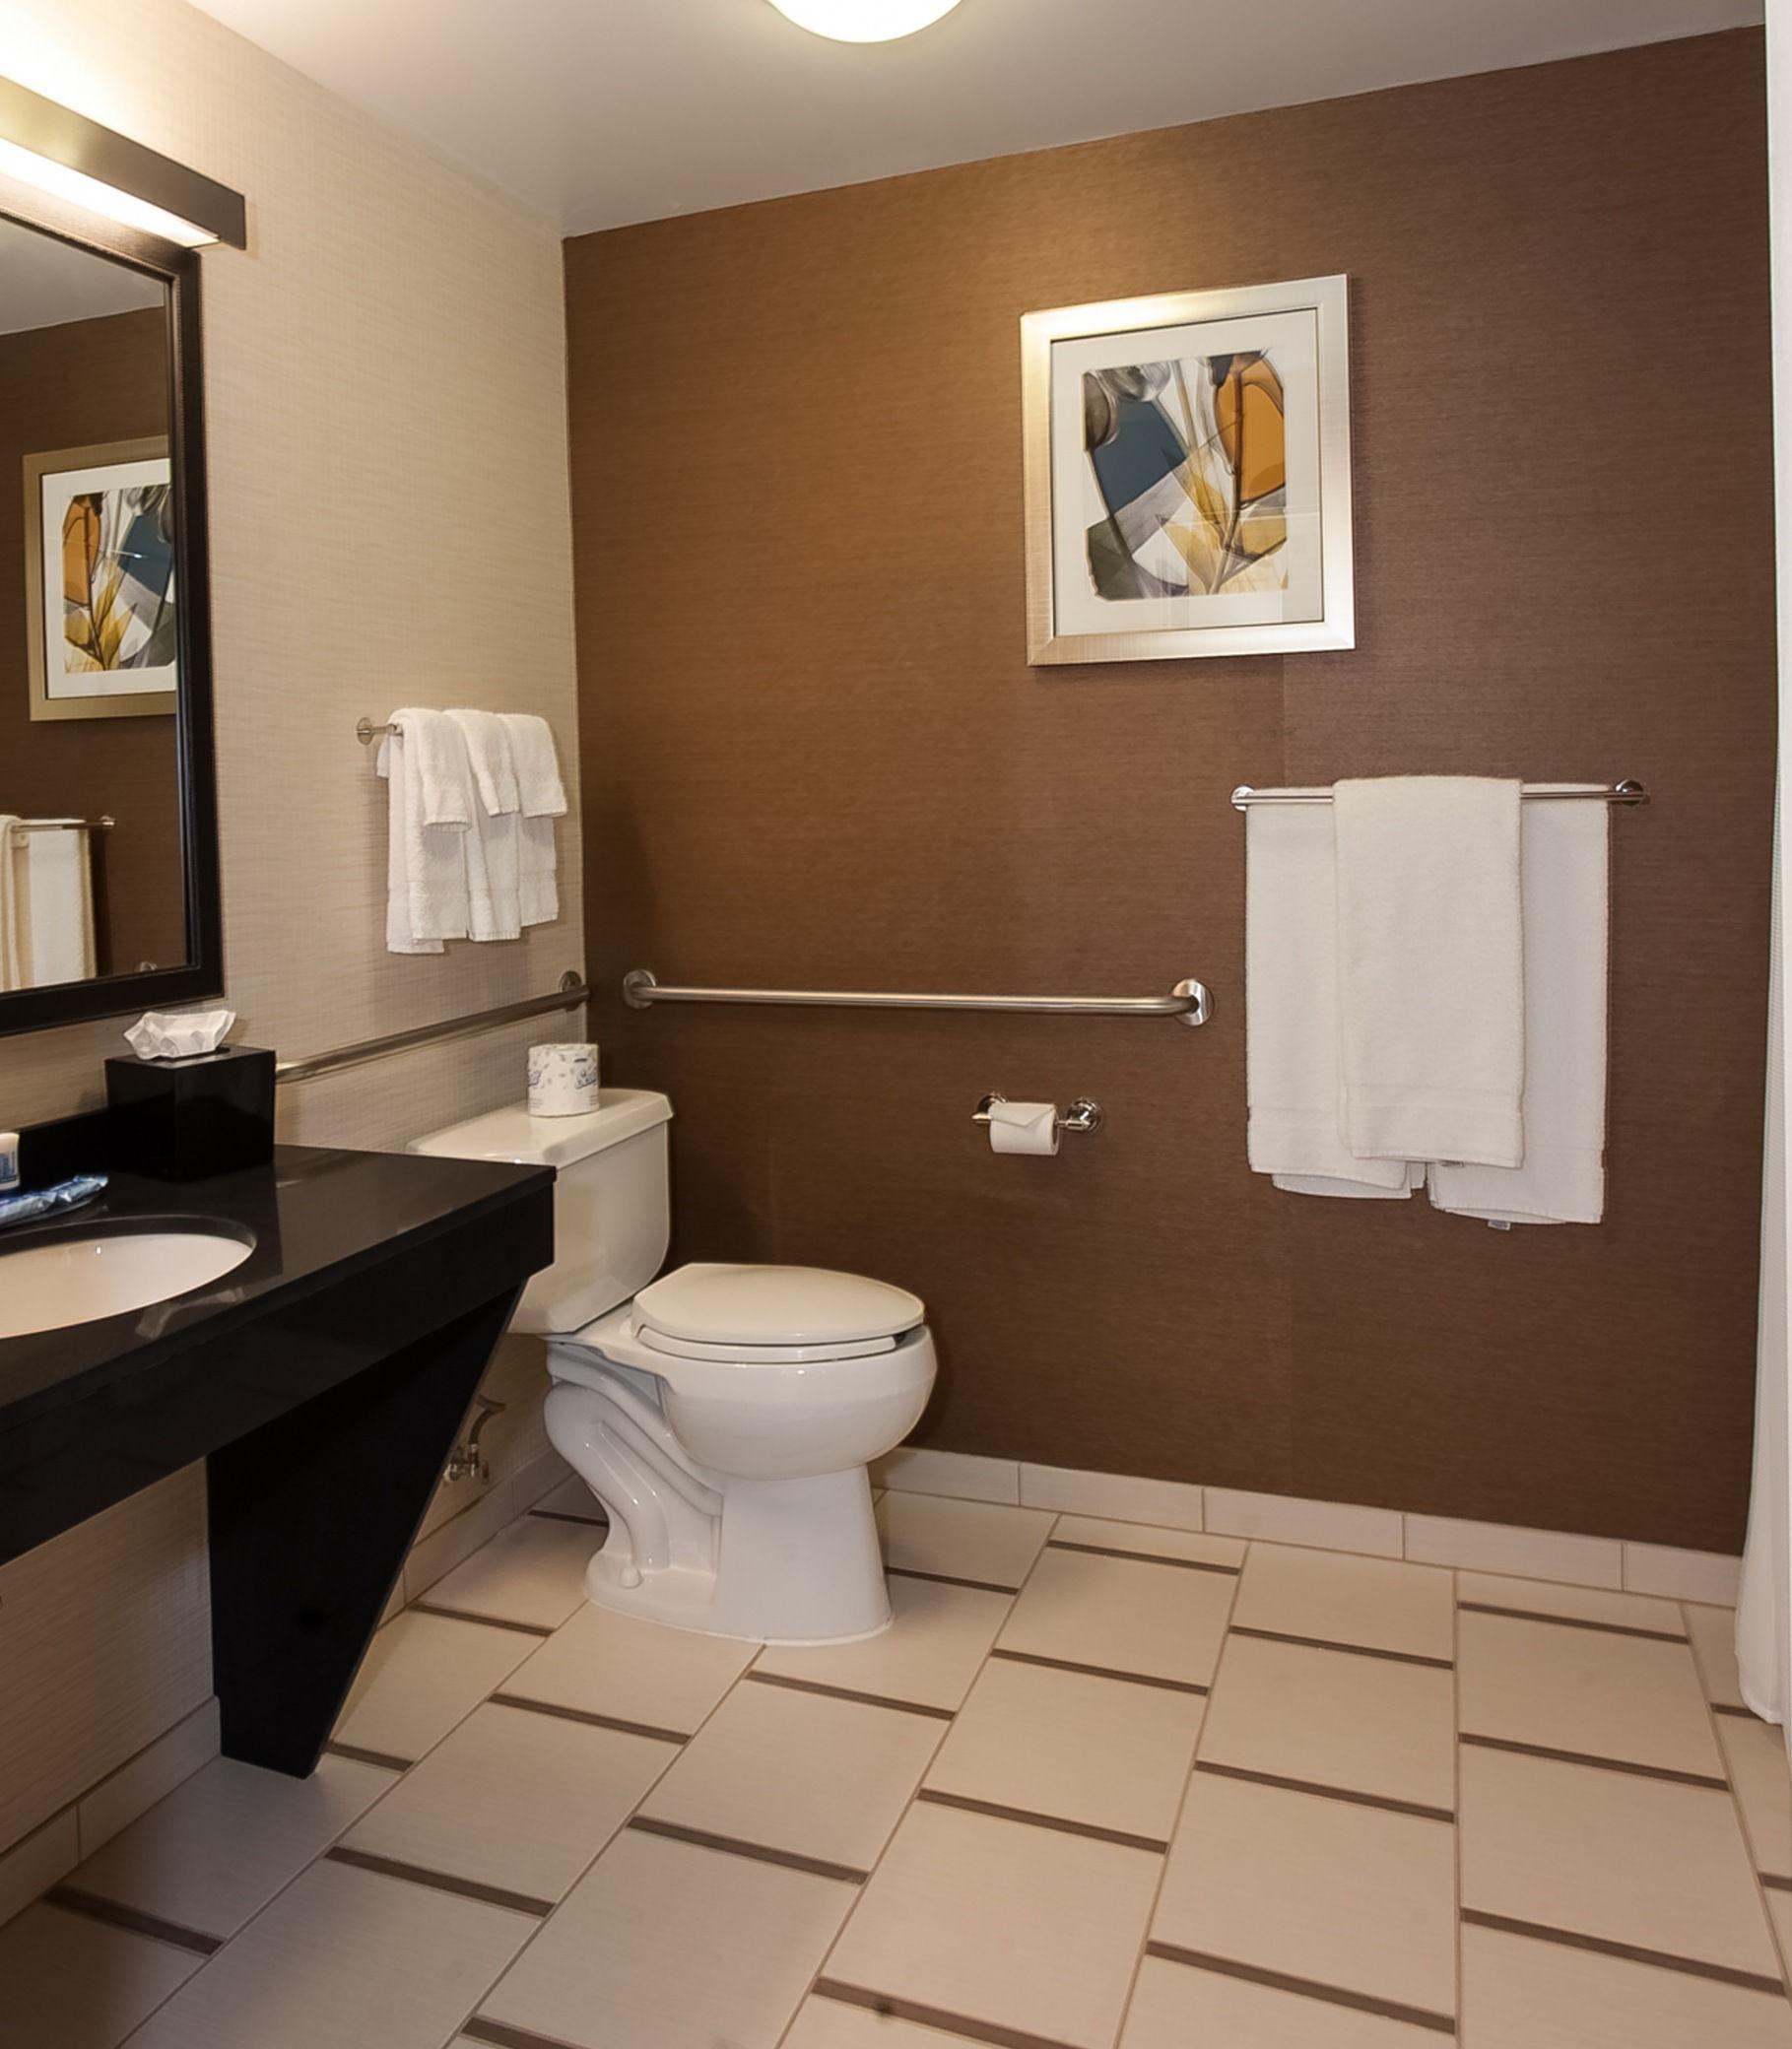 Fairfield Inn & Suites by Marriott Akron South image 1